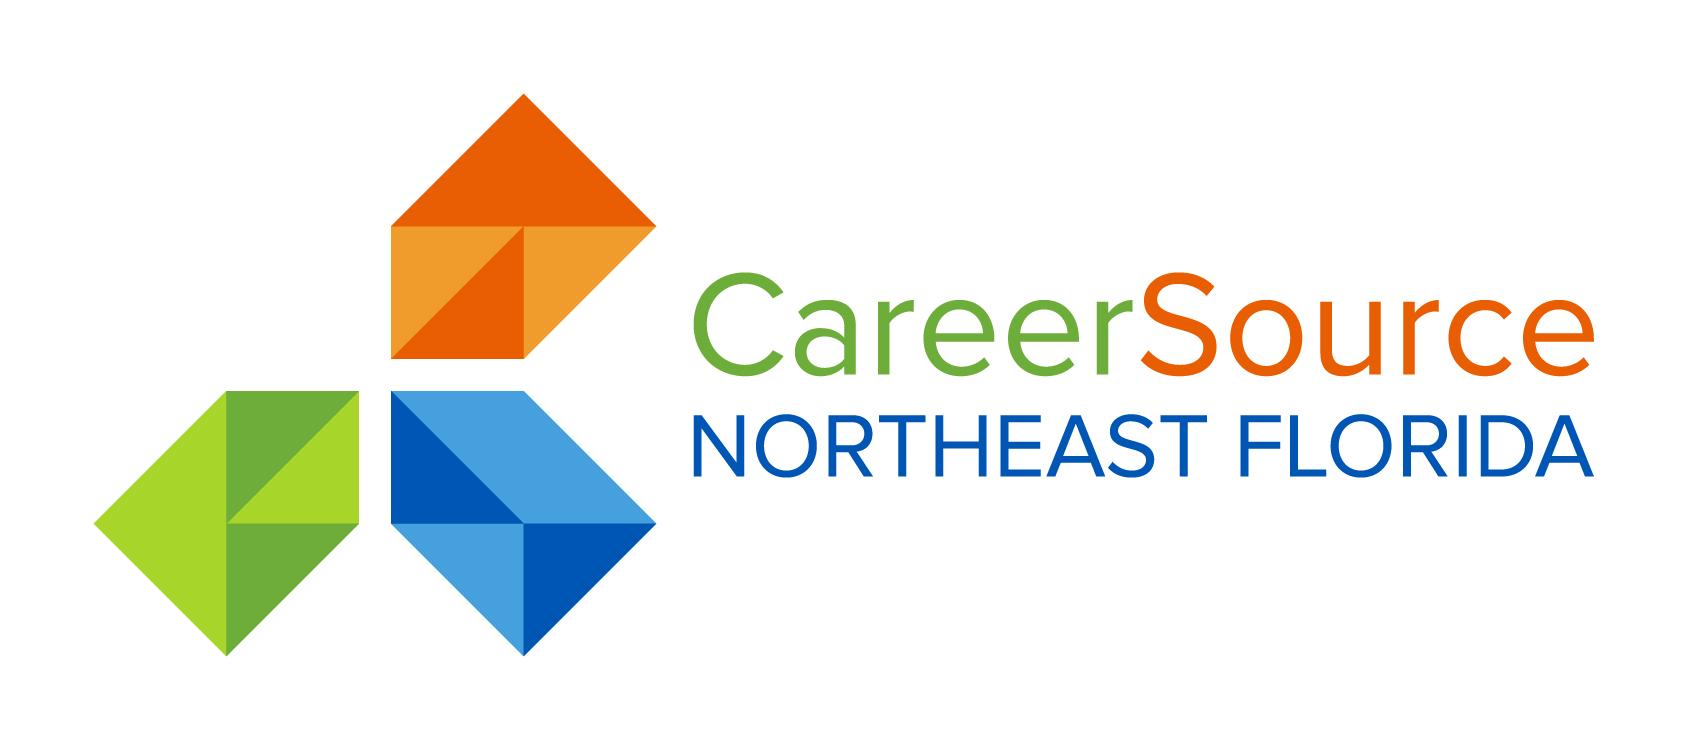 CareerSource NE Florida logo